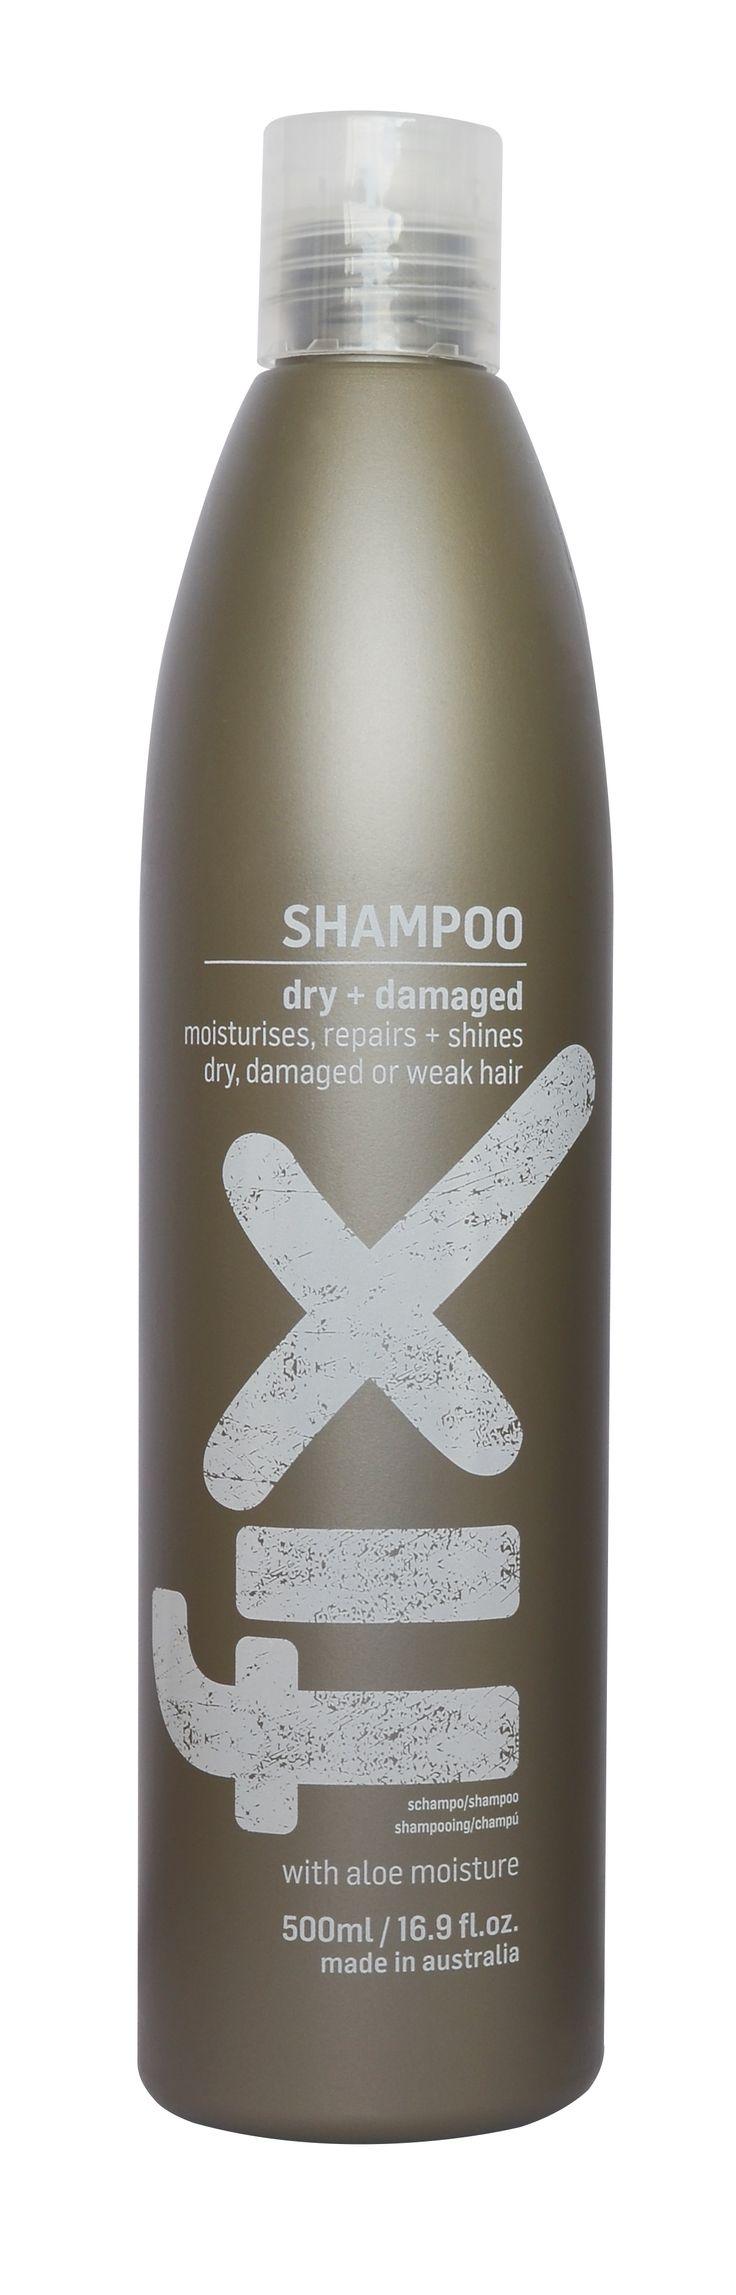 hairjamm, fix, dry, damaged, highlighted, hair, haircare, aloe moisture, moisturises, repairs, australian made, JuuceAustralia